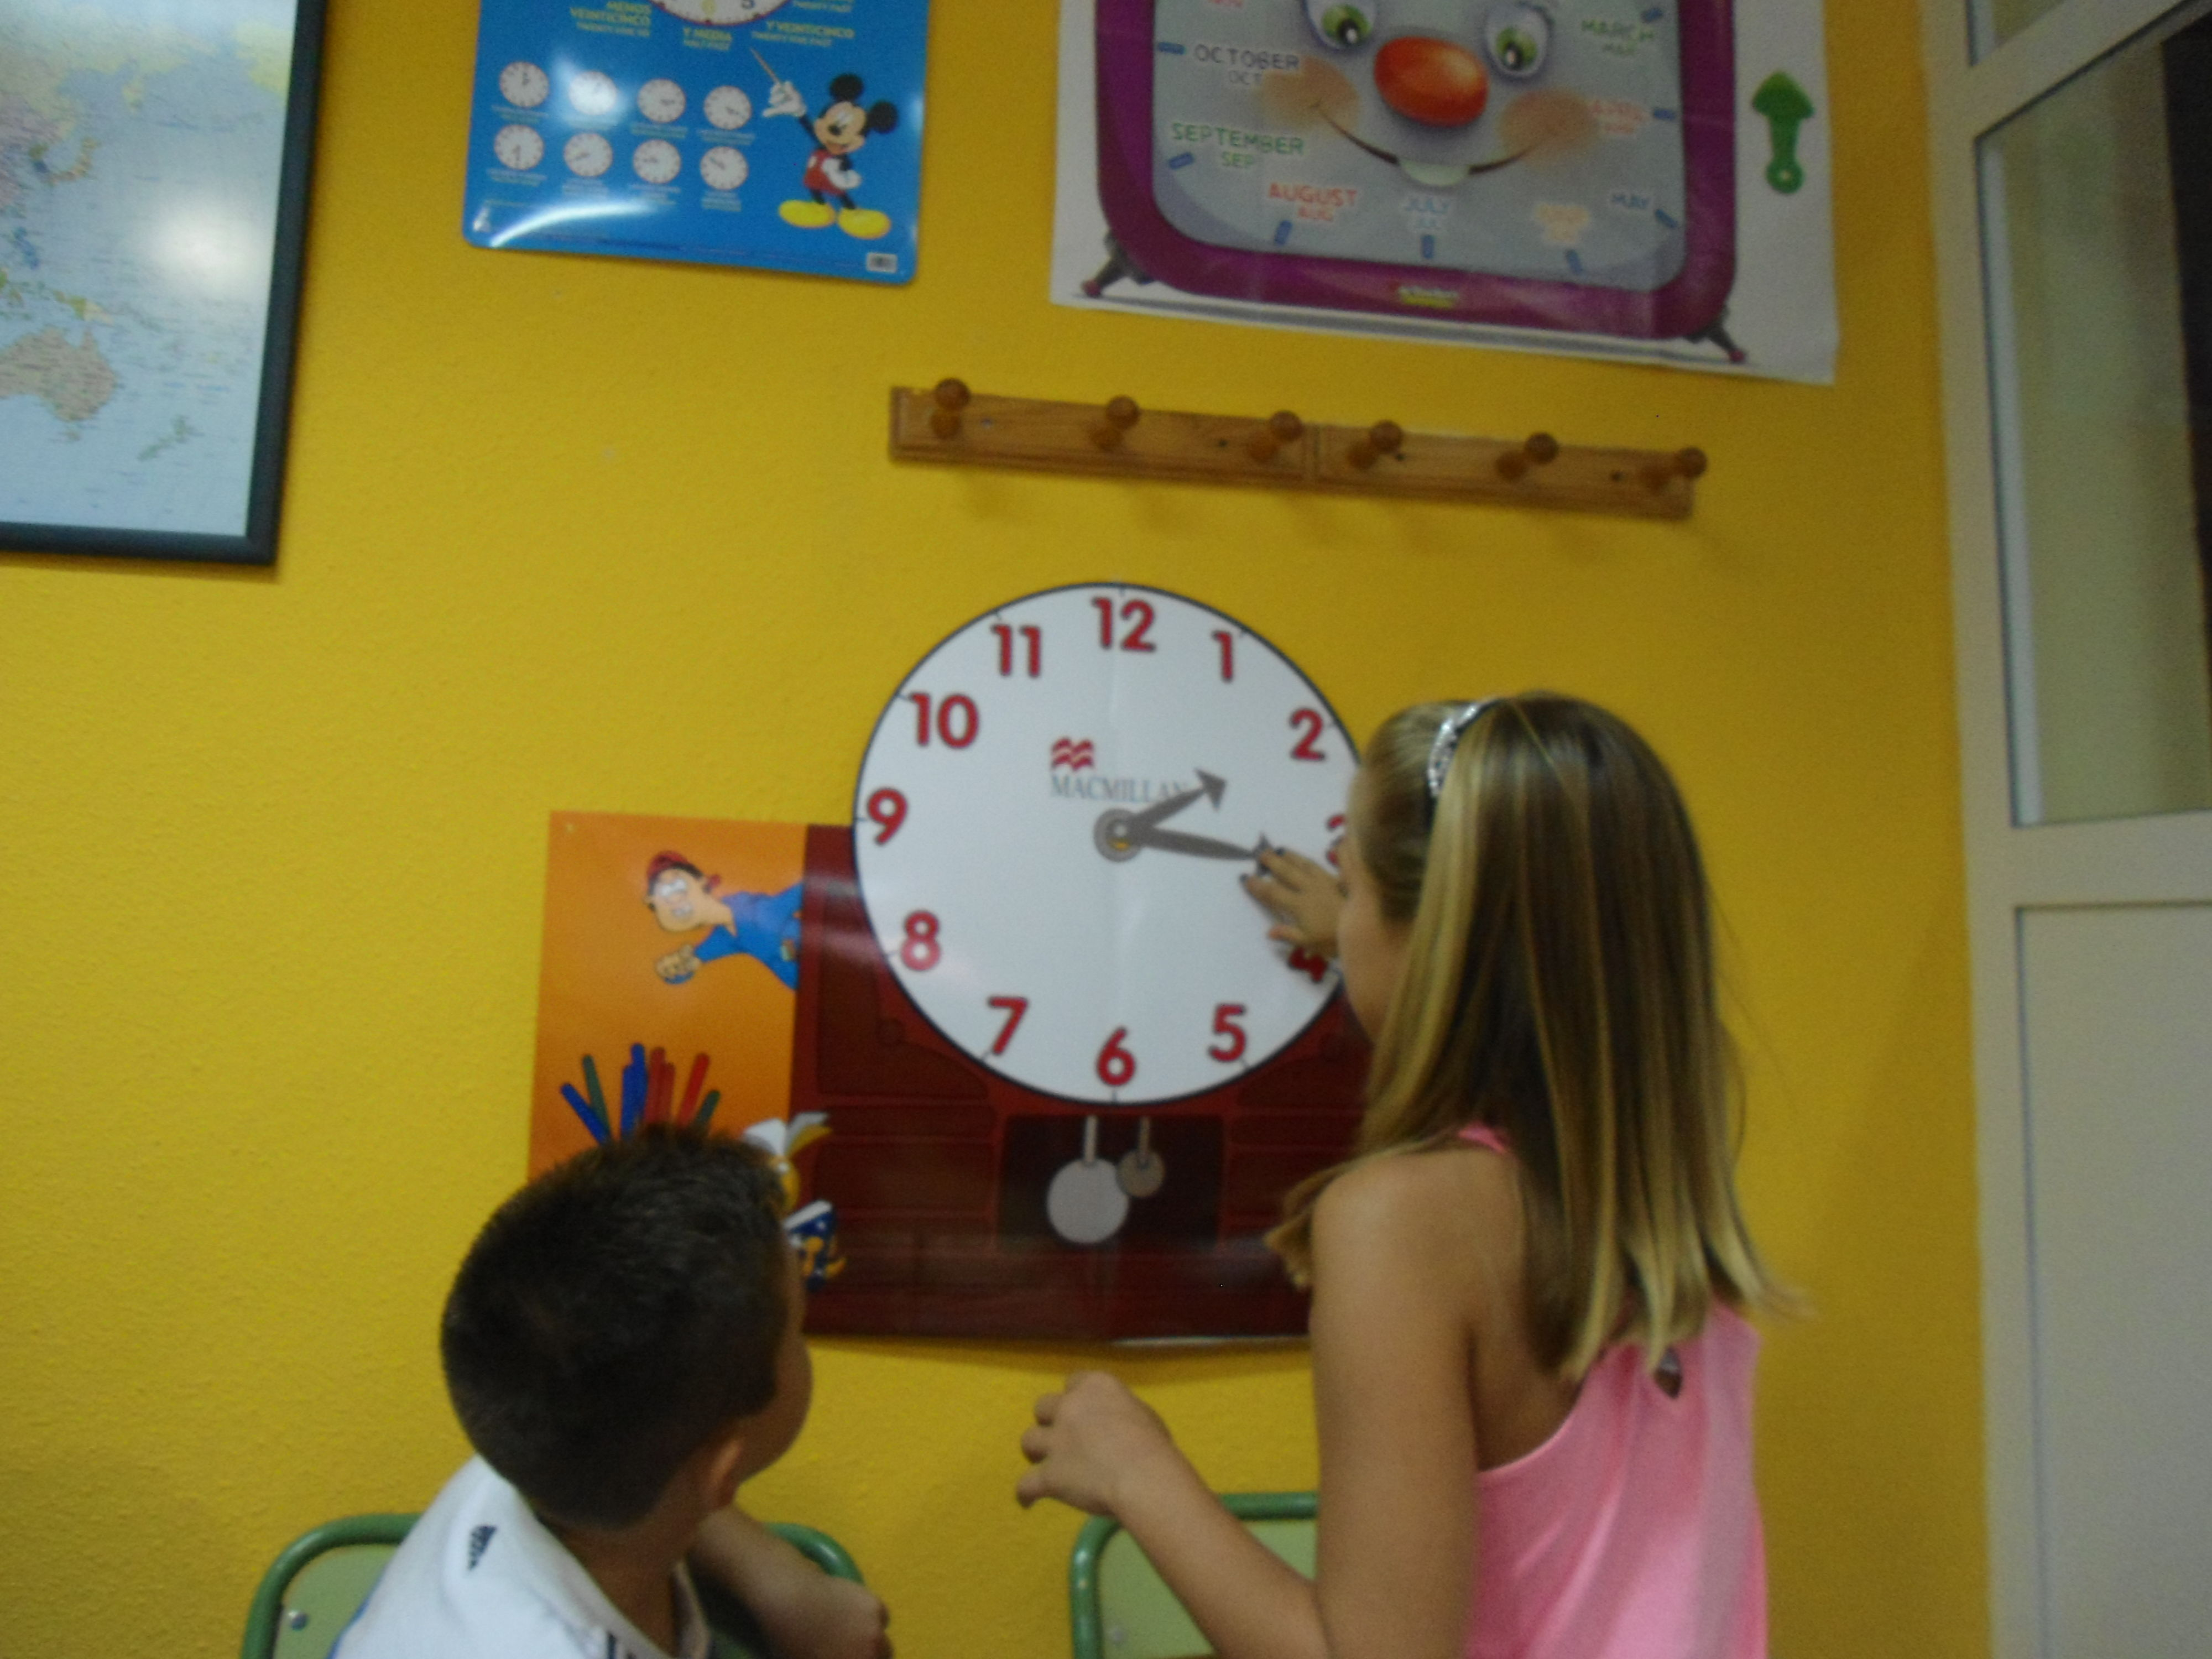 Foto 27 de Academias de idiomas en Moncada | Centre d'Estudis Etnies